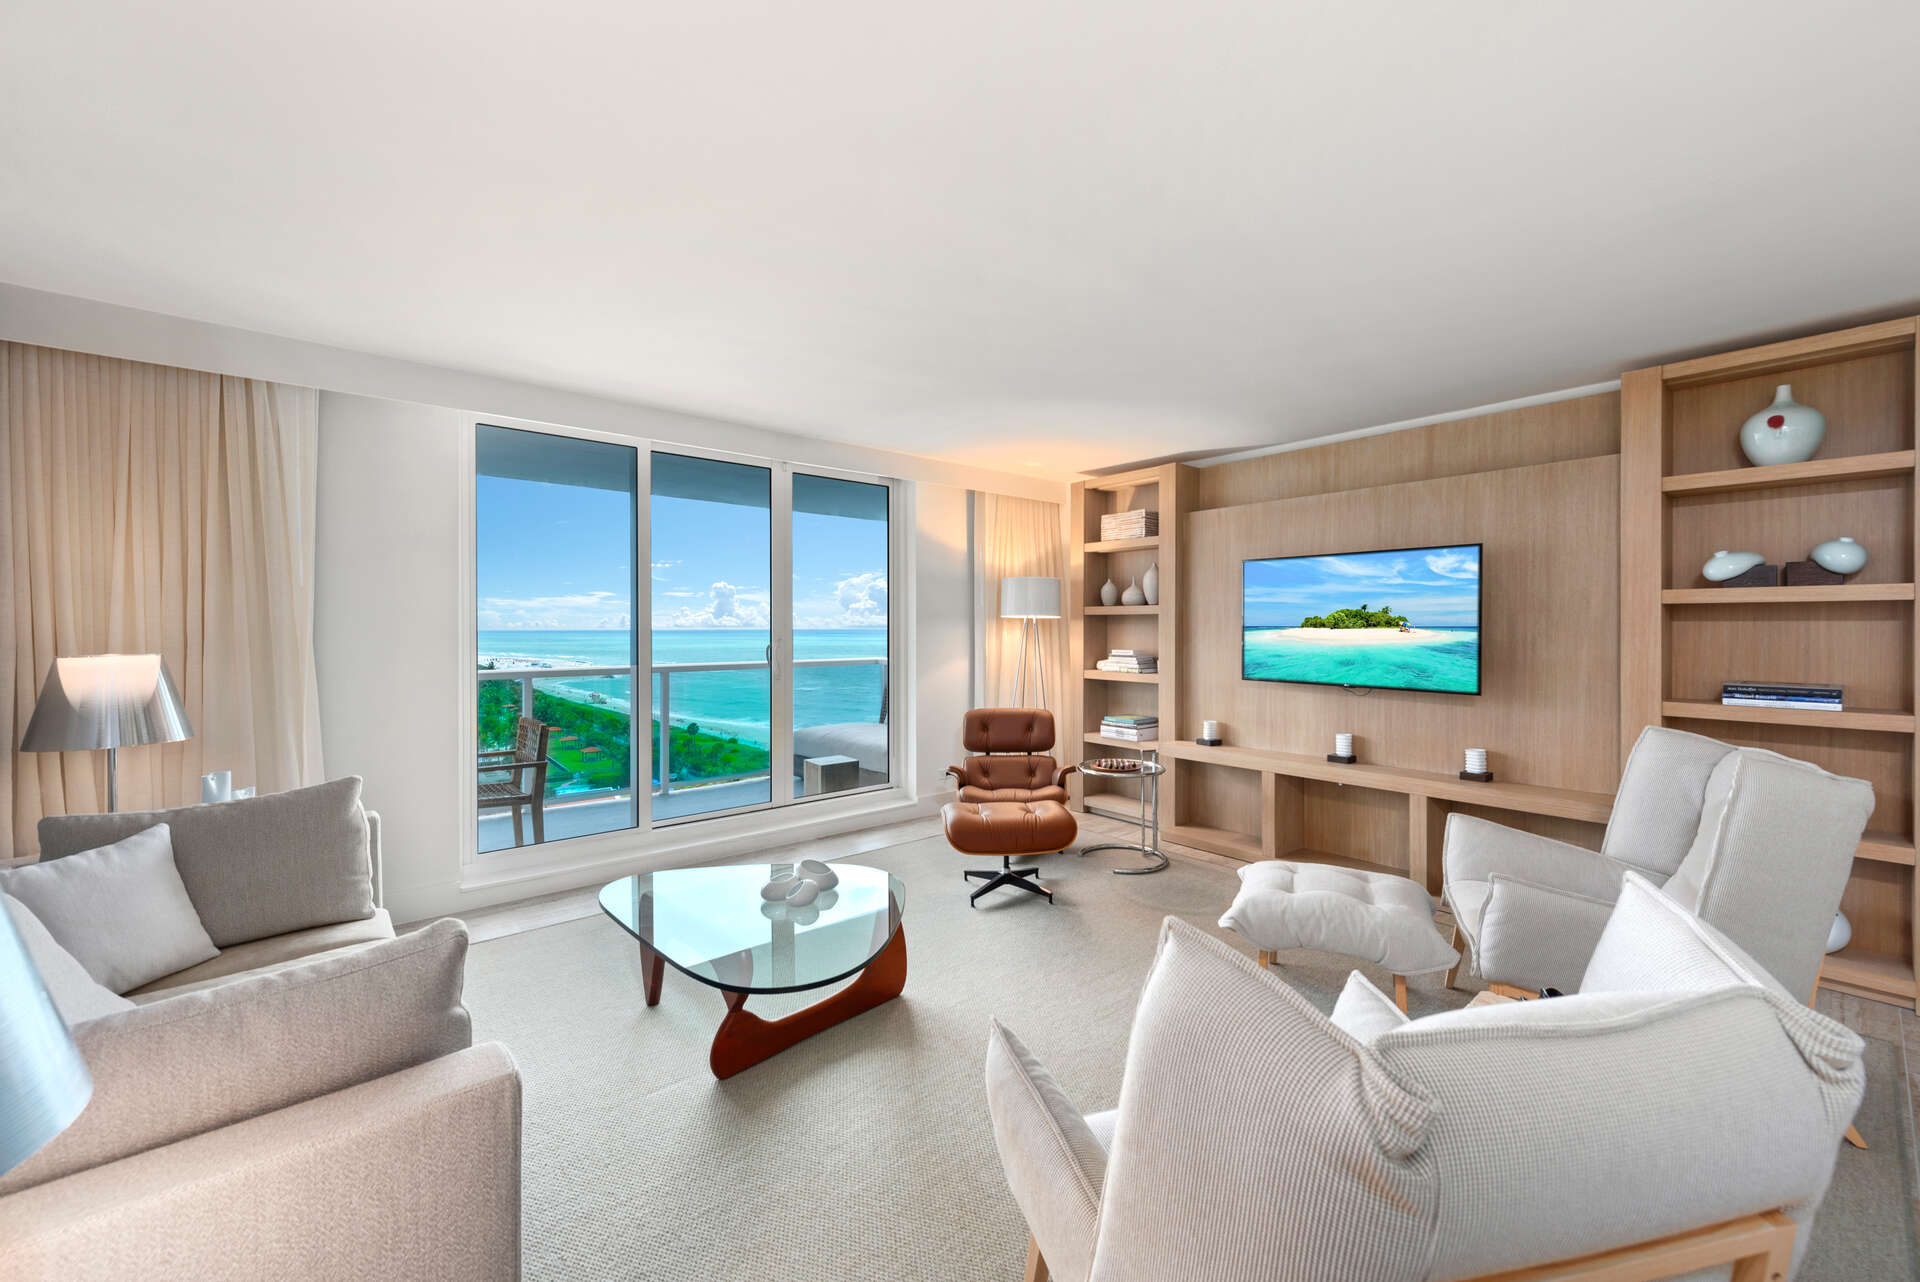 Luxury vacation rentals usa - Florida - Miami beach - Eco hotel southbeach - #1219 | 3 BDM Oceanfront - Image 1/17